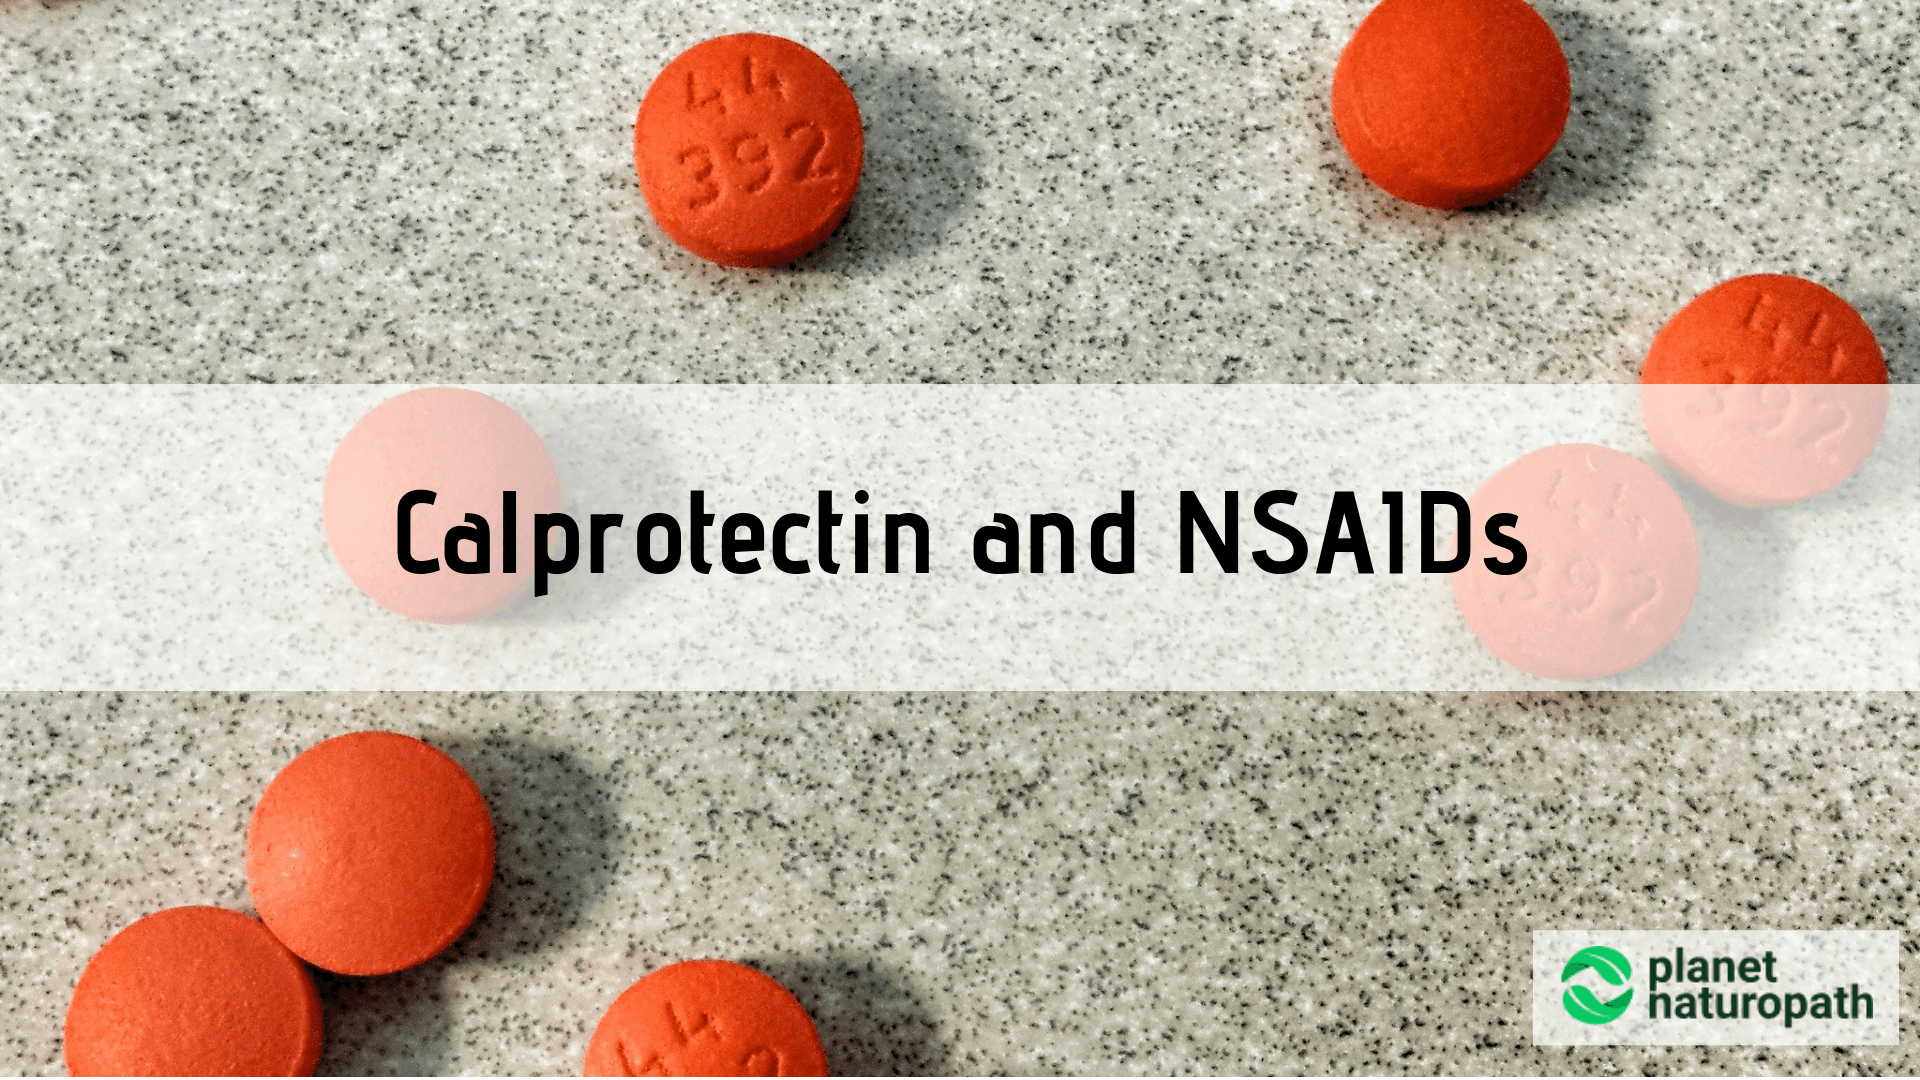 Calprotectin-and-NSAIDs